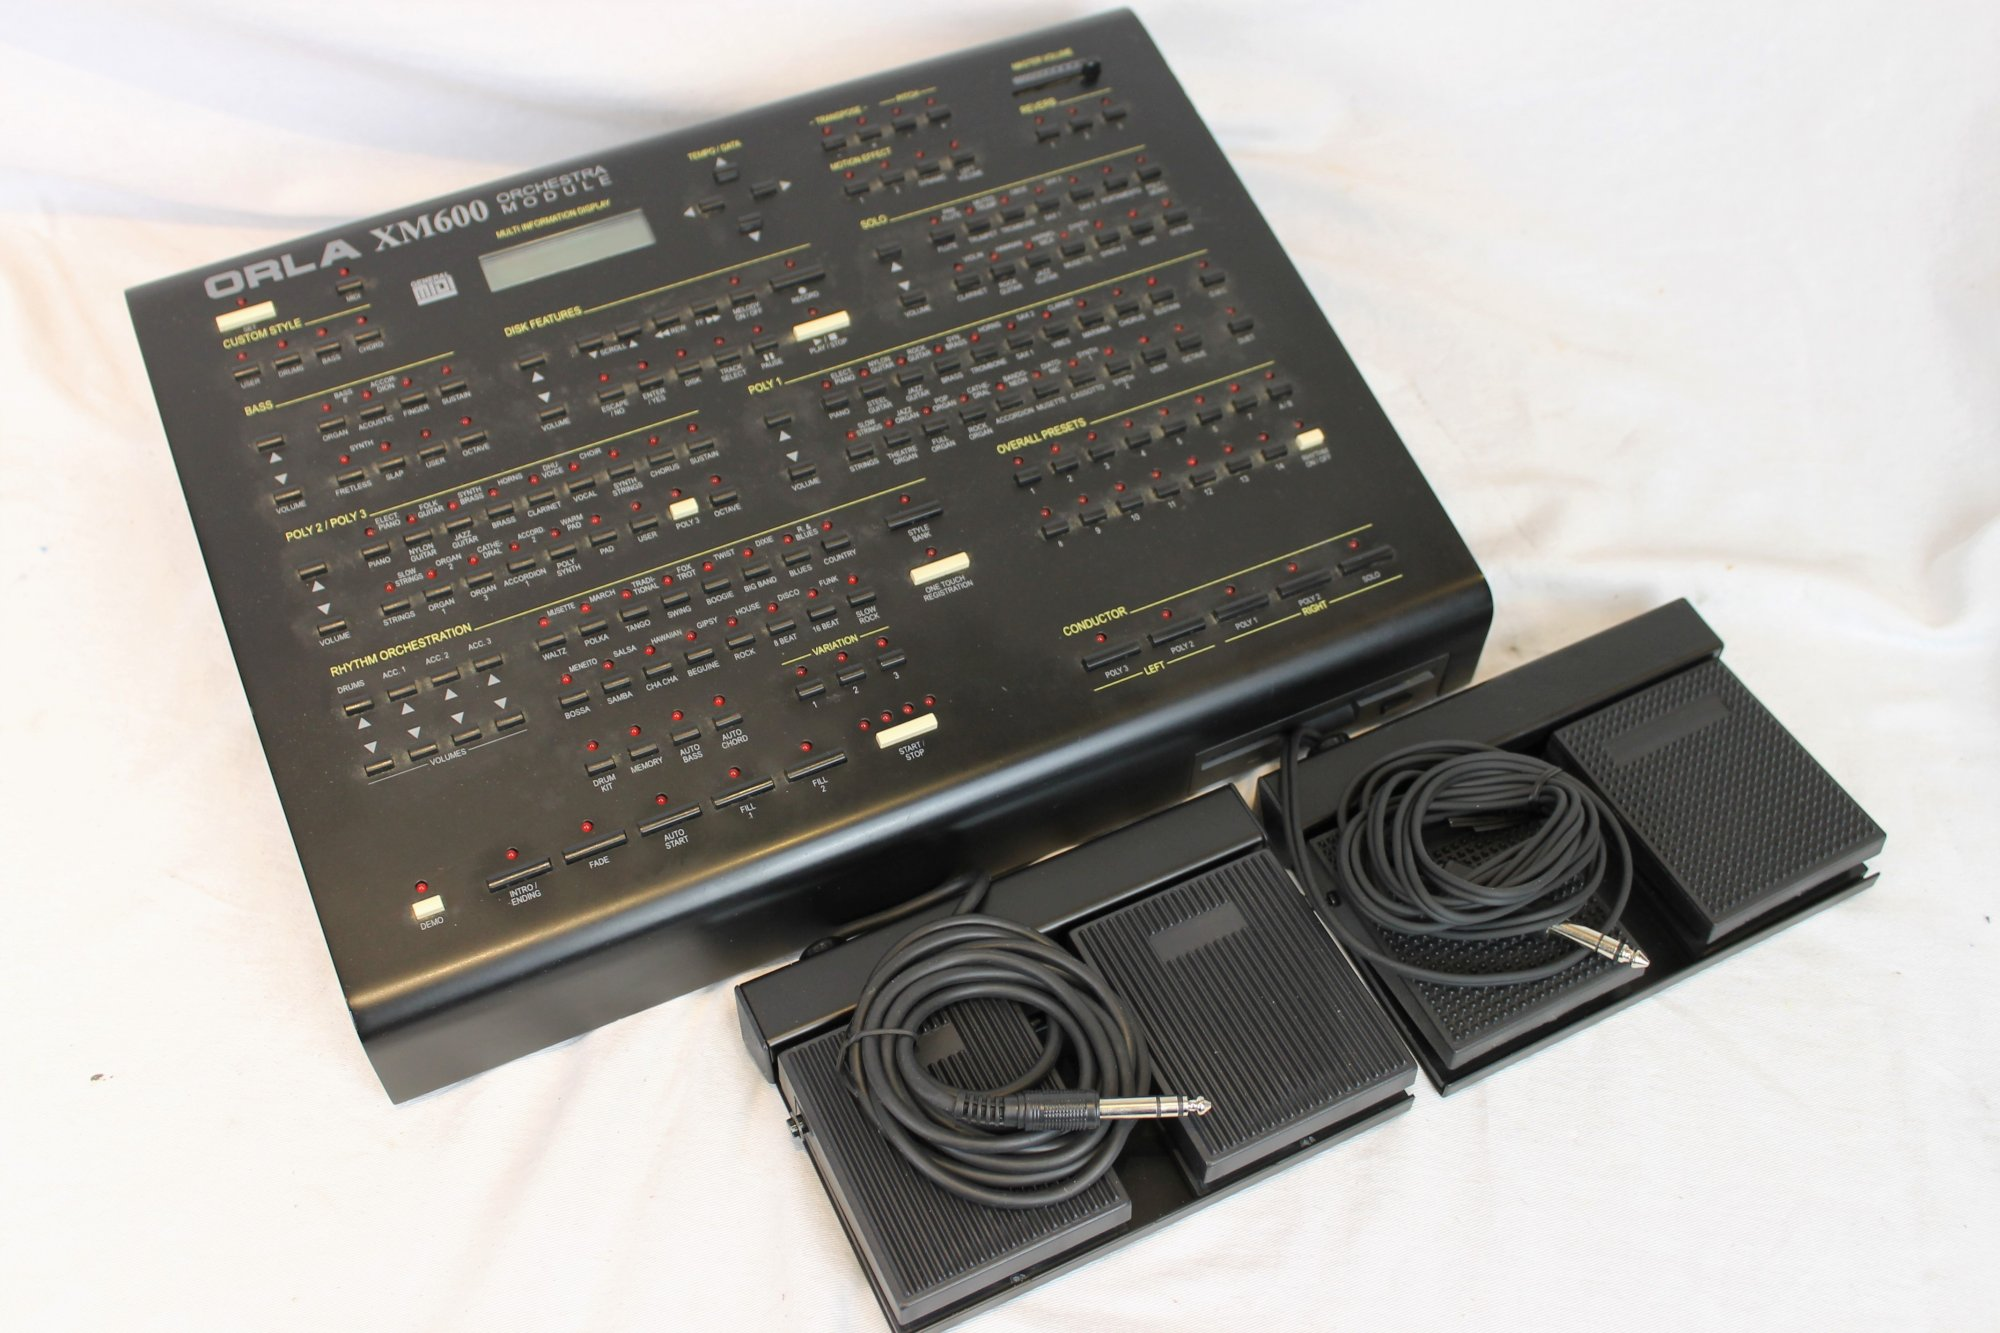 4188 - Orla XM600 Arranger and Sound Module